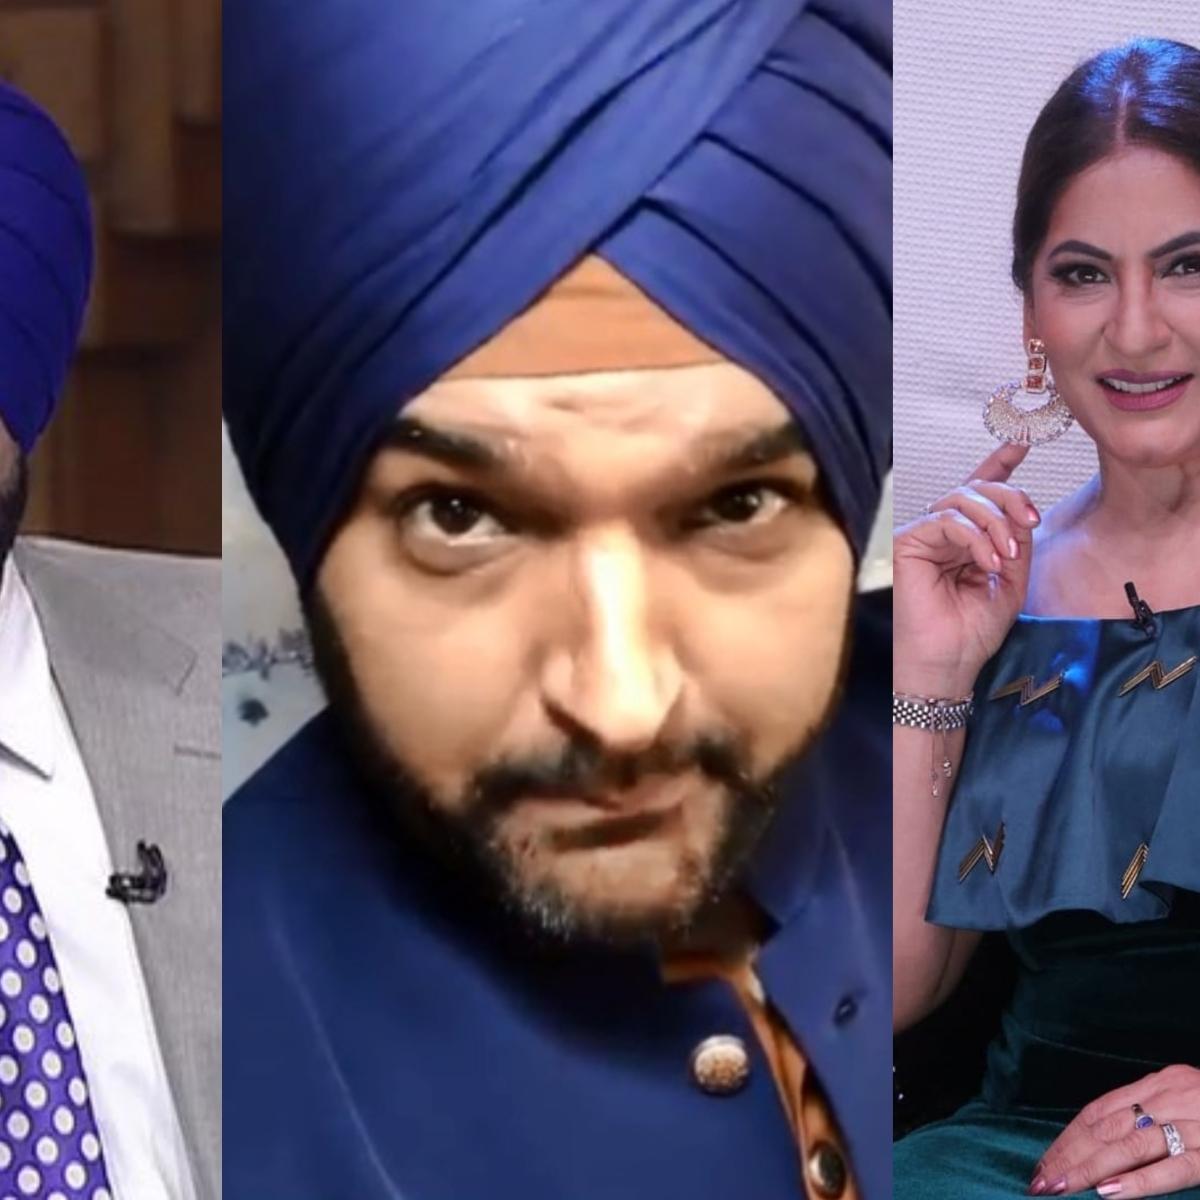 Watch Video: Kapil Sharma dresses up as Navjot Singh Sidhu, taunts Archana Puran Singh